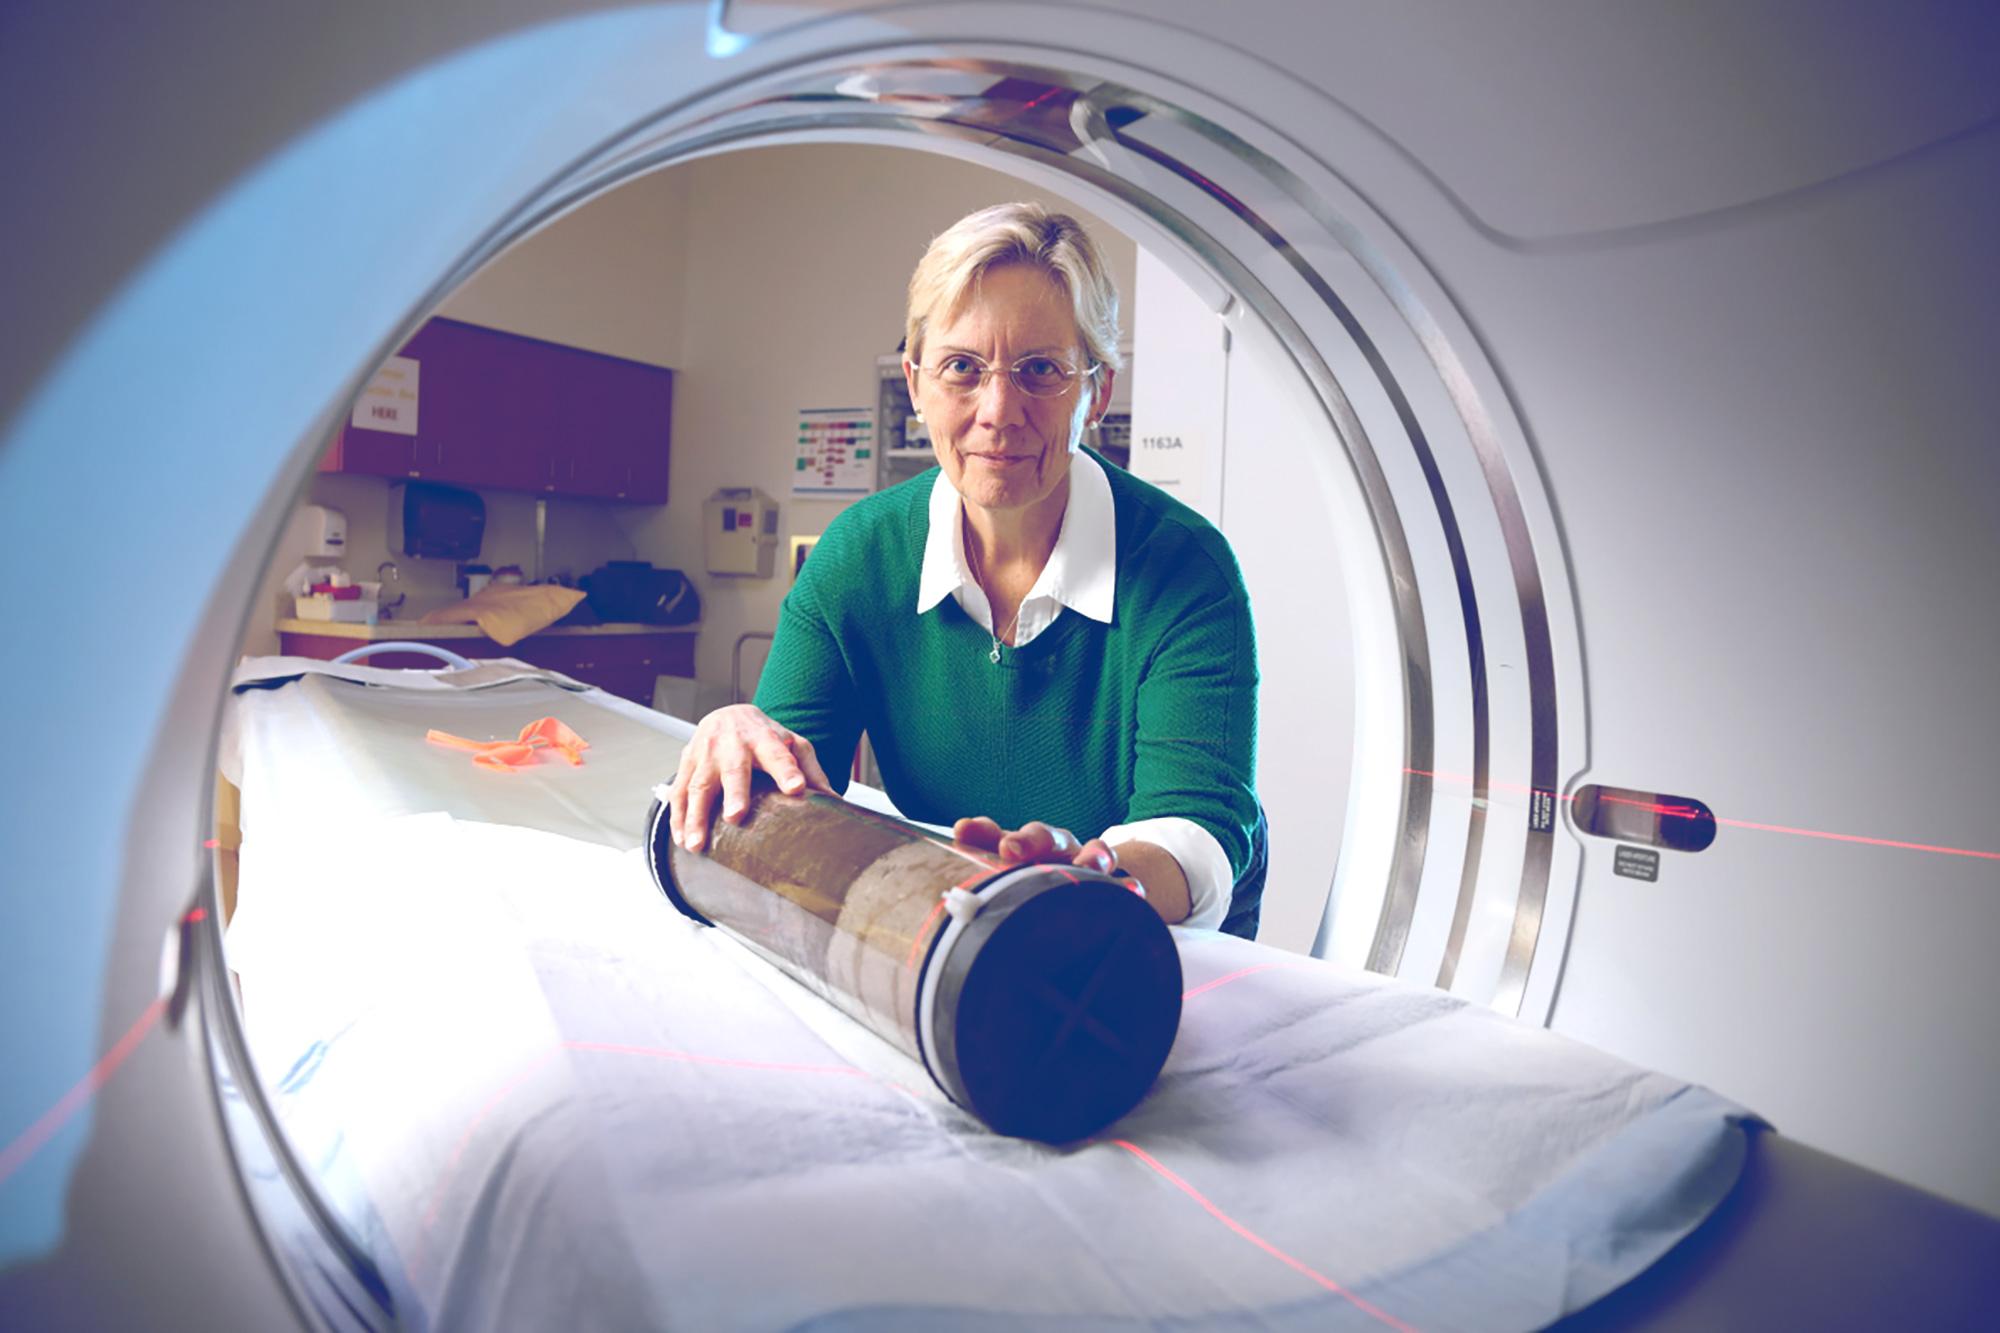 Environmental scientist Linda Blum uses CT scan facilities at the UVA Health System to examine salt marsh core samples.